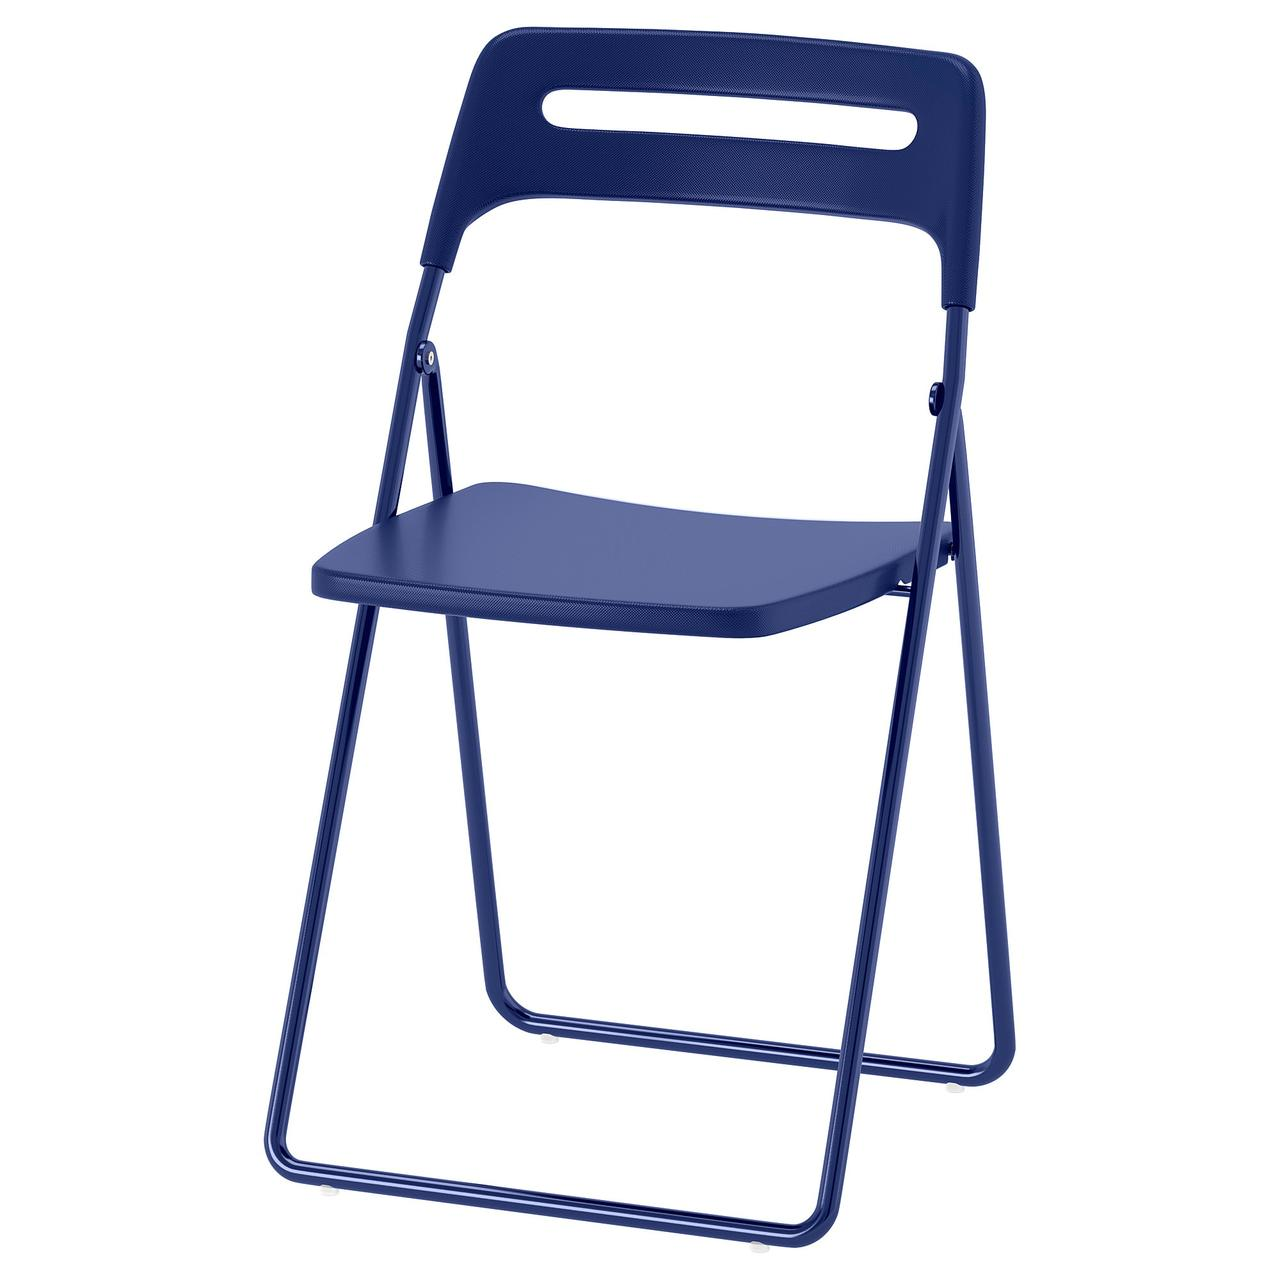 Складное кресло IKEA NISSE темно-синее 904.124.26